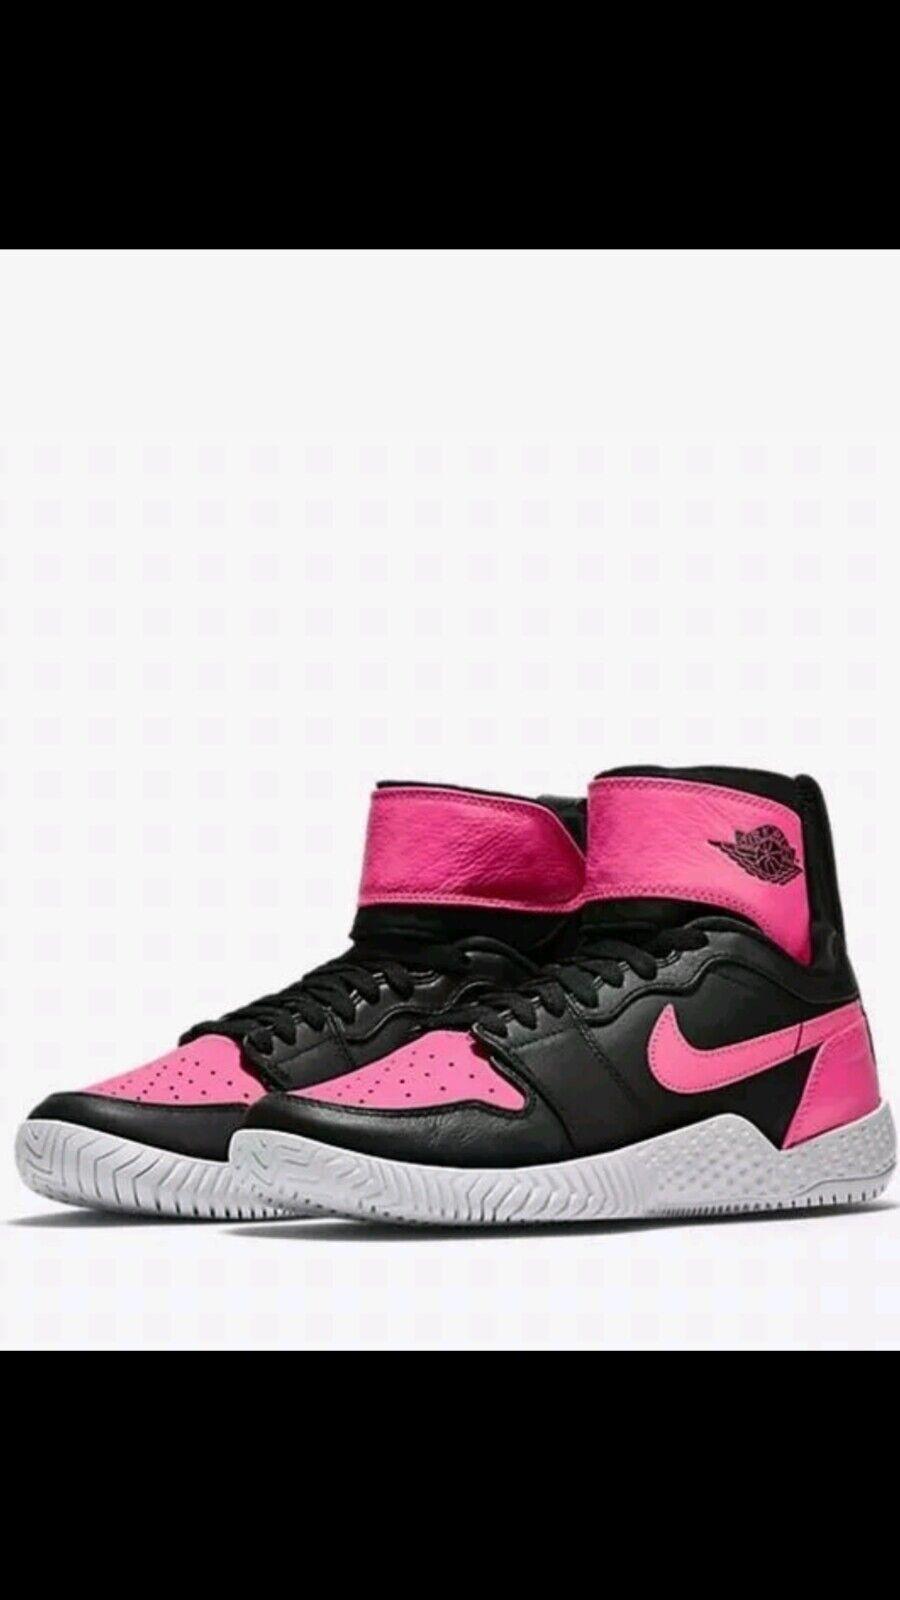 Wmns Nike FLARE LG Qs AJ 1 Jordan Serena Williams tenis Reino Unido 6.5